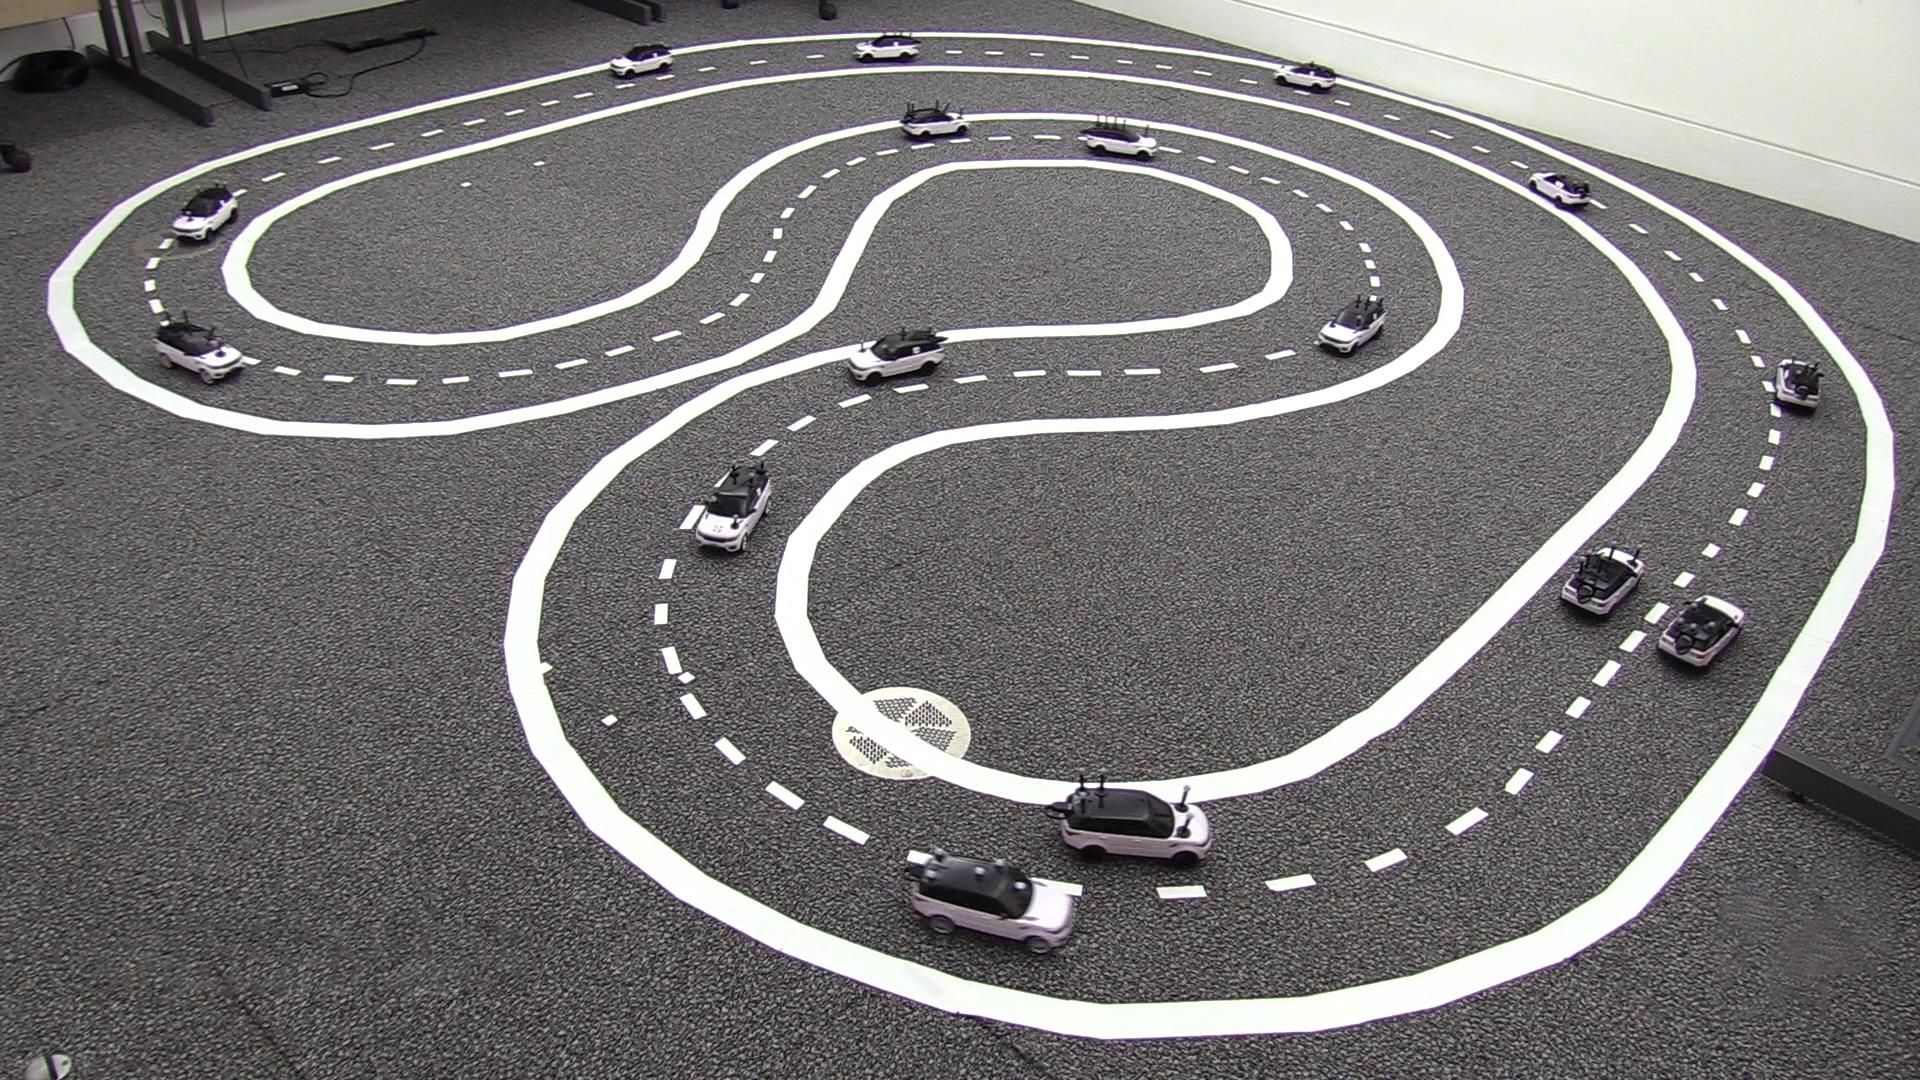 driverless cars improve traffic